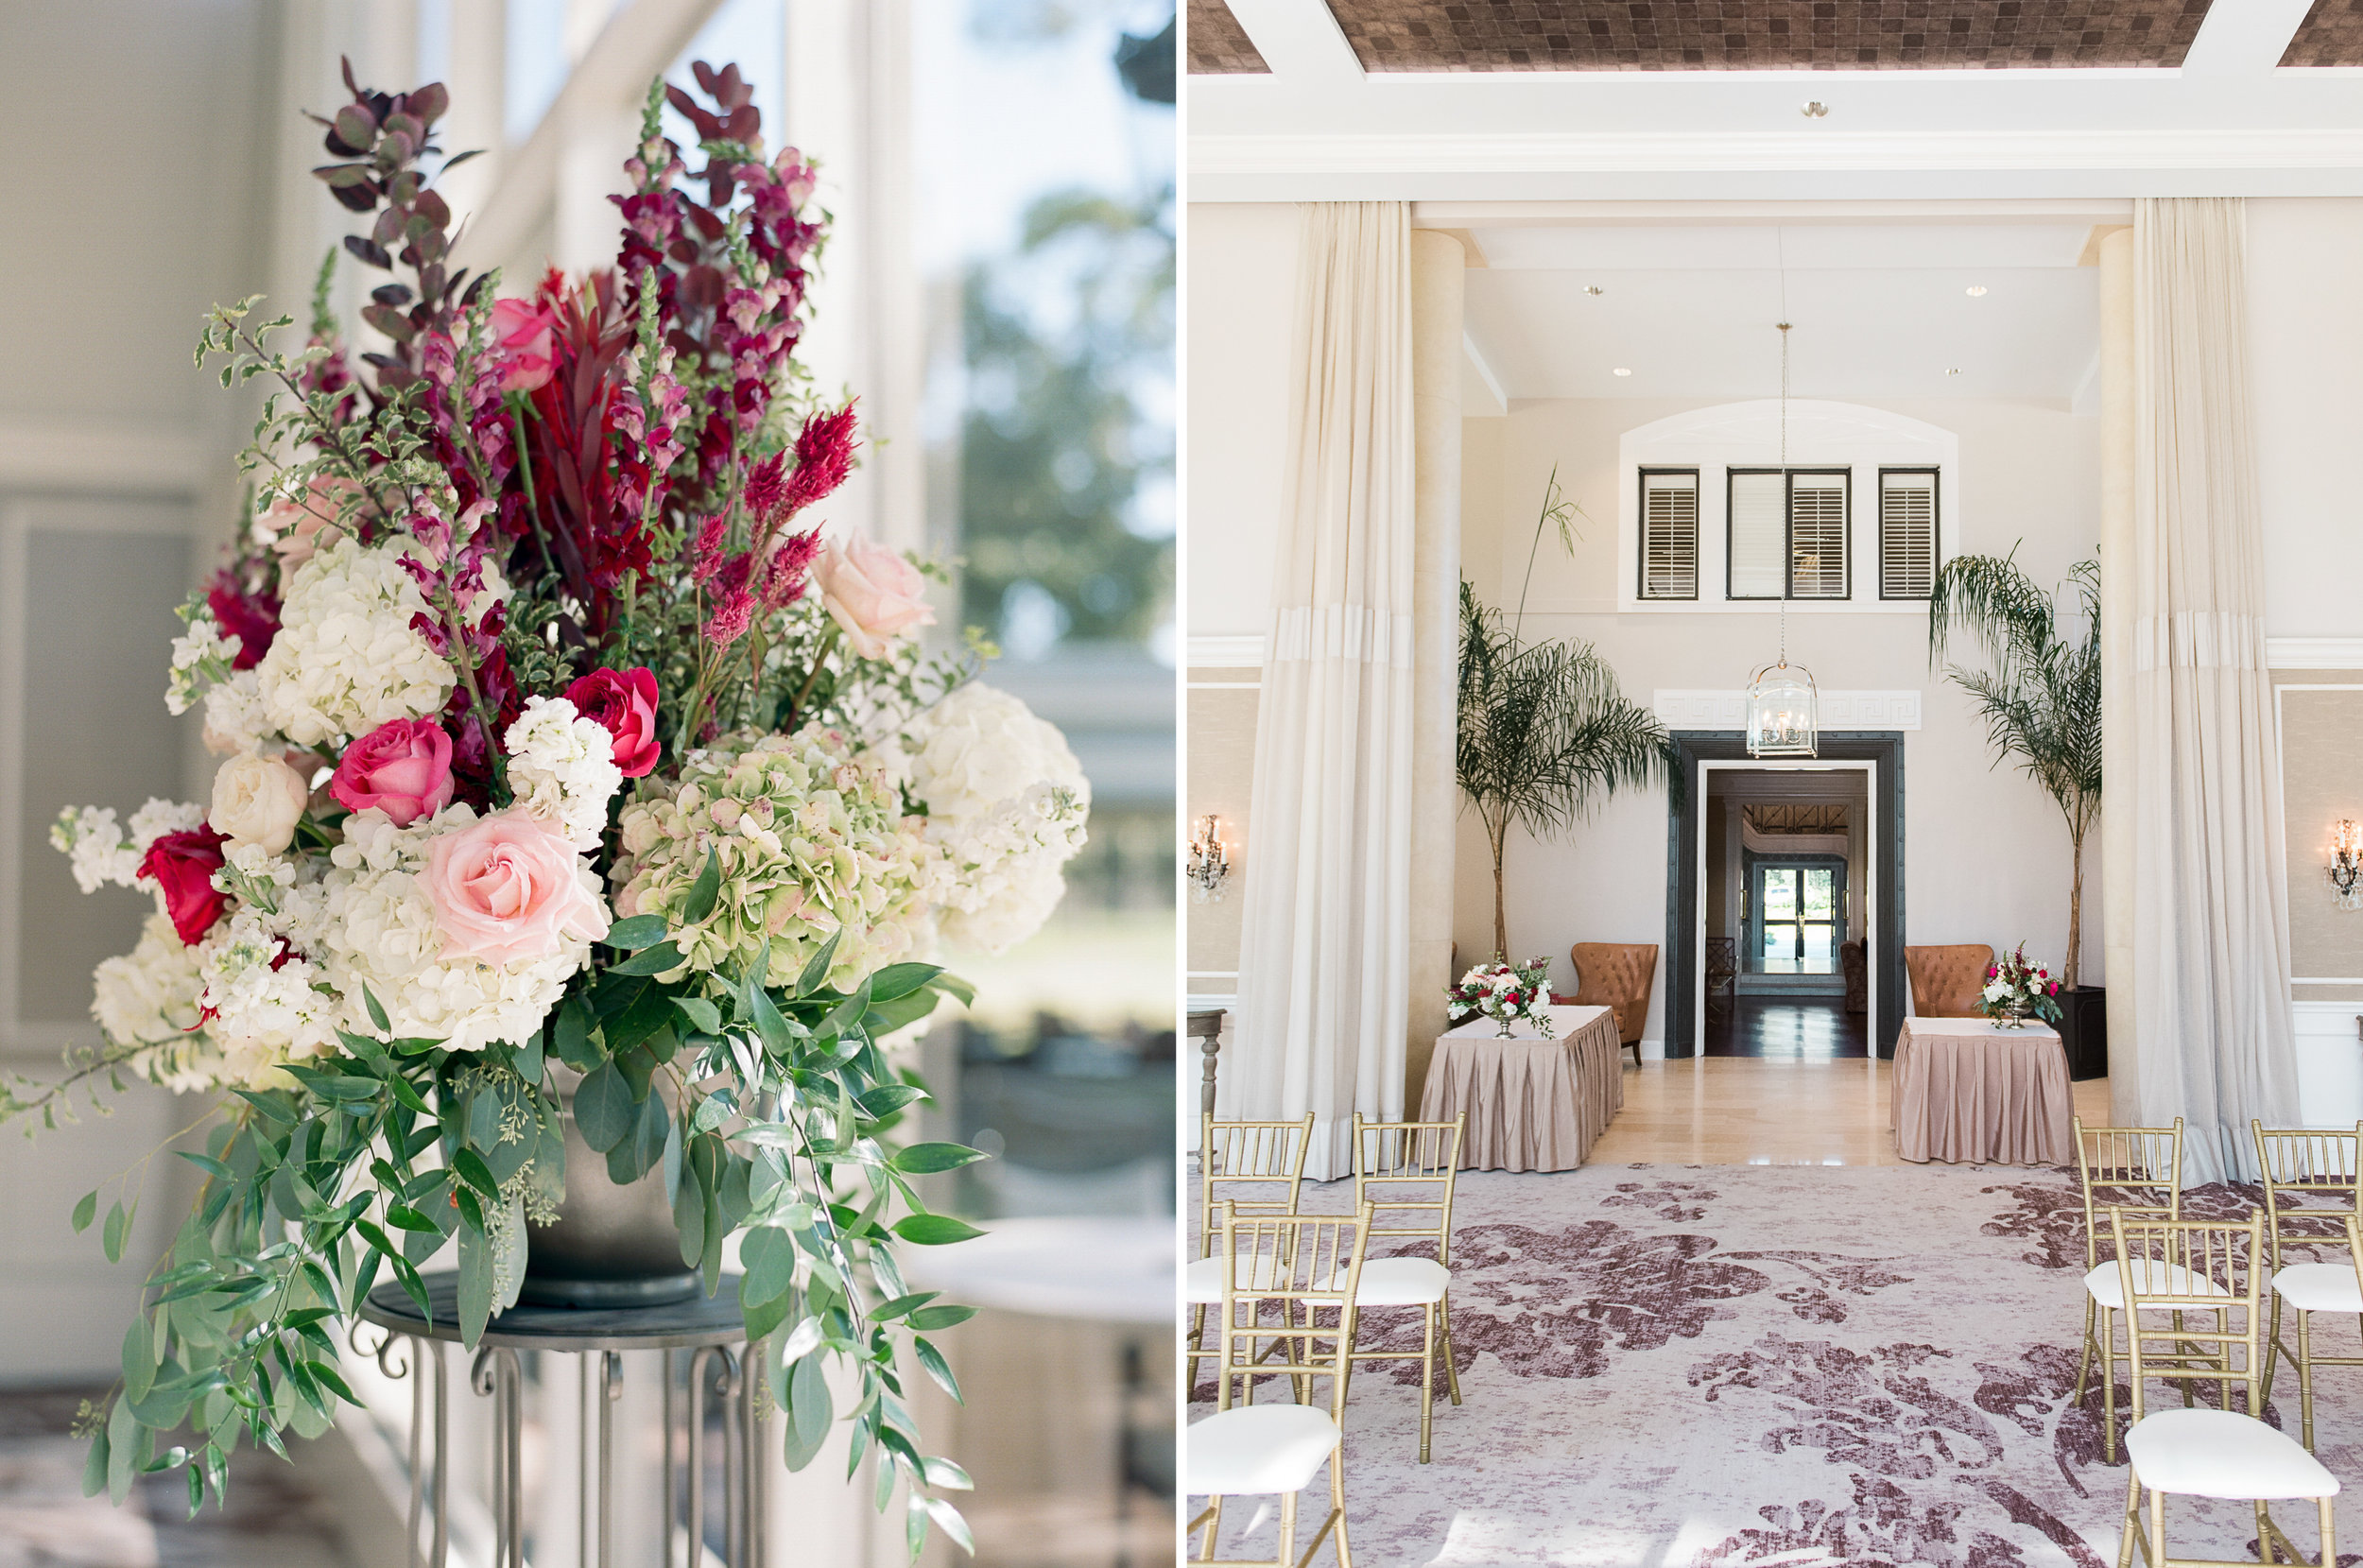 Houston-Wedding-Photographer-Lakeside-Country-Club-First-Look-Bride-Groom-Formals-Film-Fine-Art-Photography-112.jpg